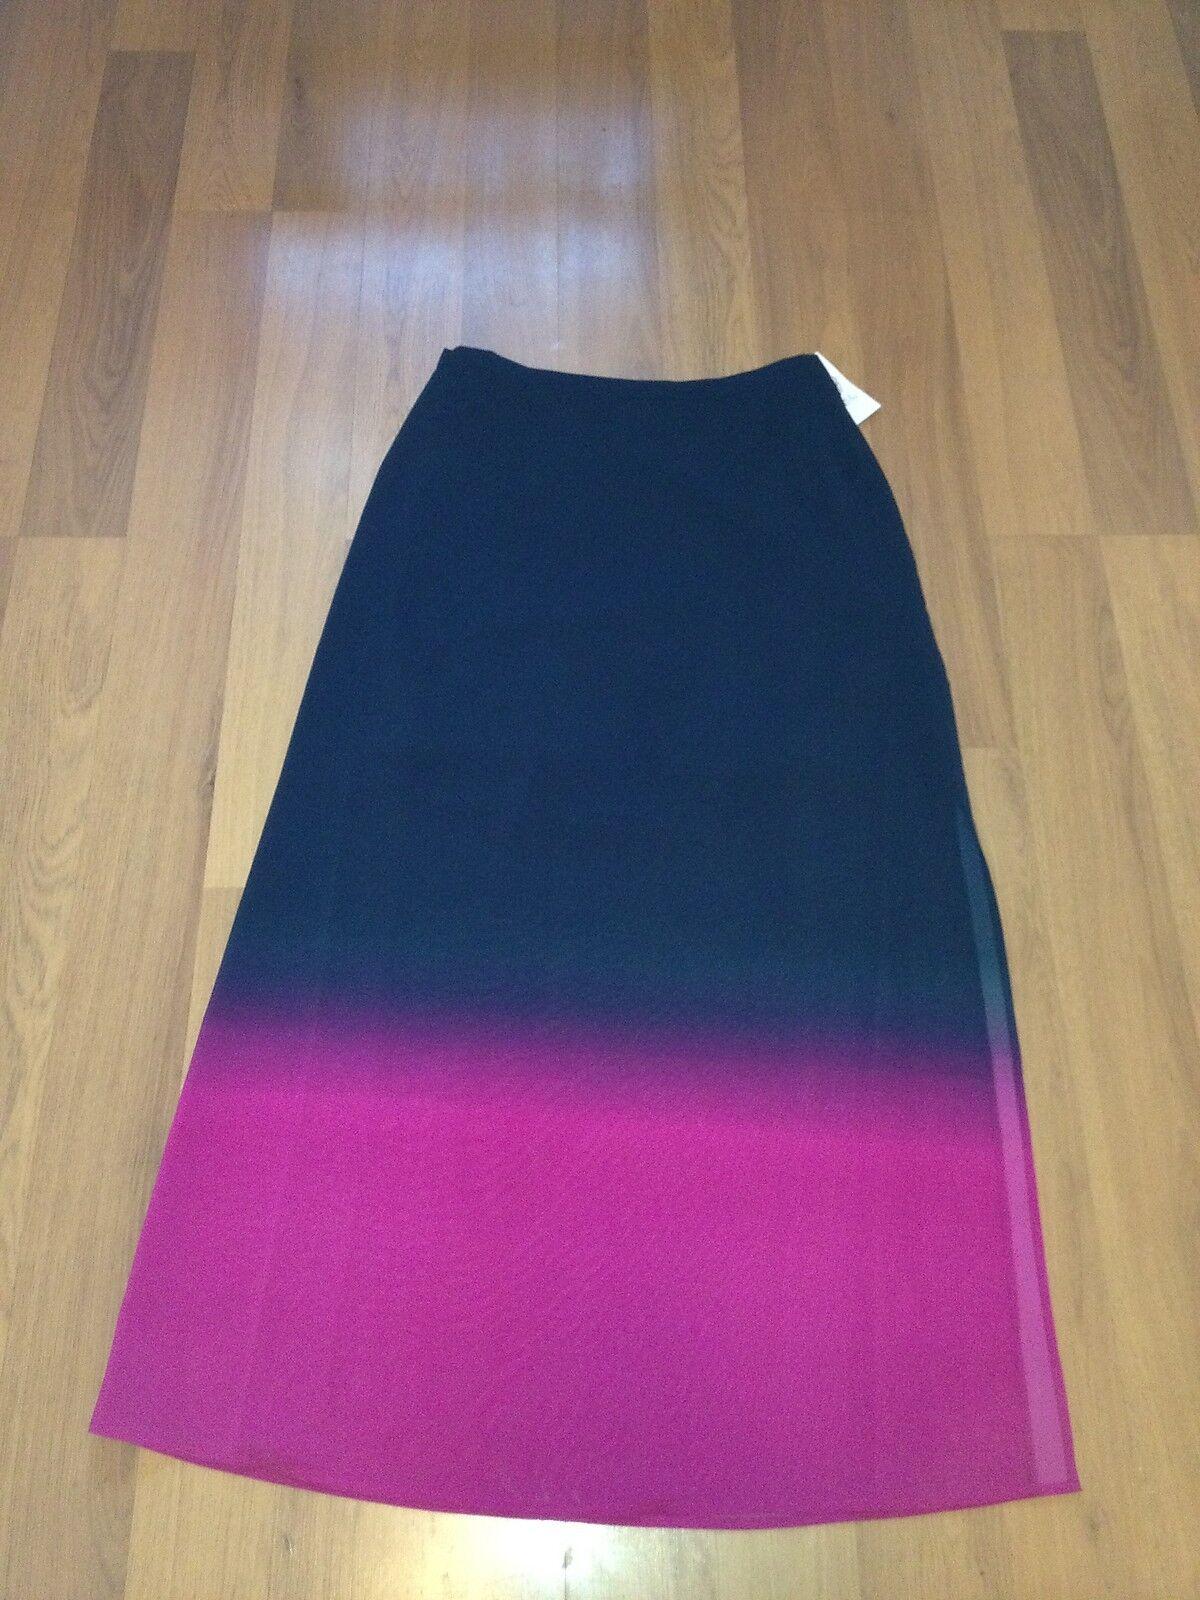 Vince Camuto Women's Skirt Long bluee & Pink Super Soft Skirt Size 8 Nwt